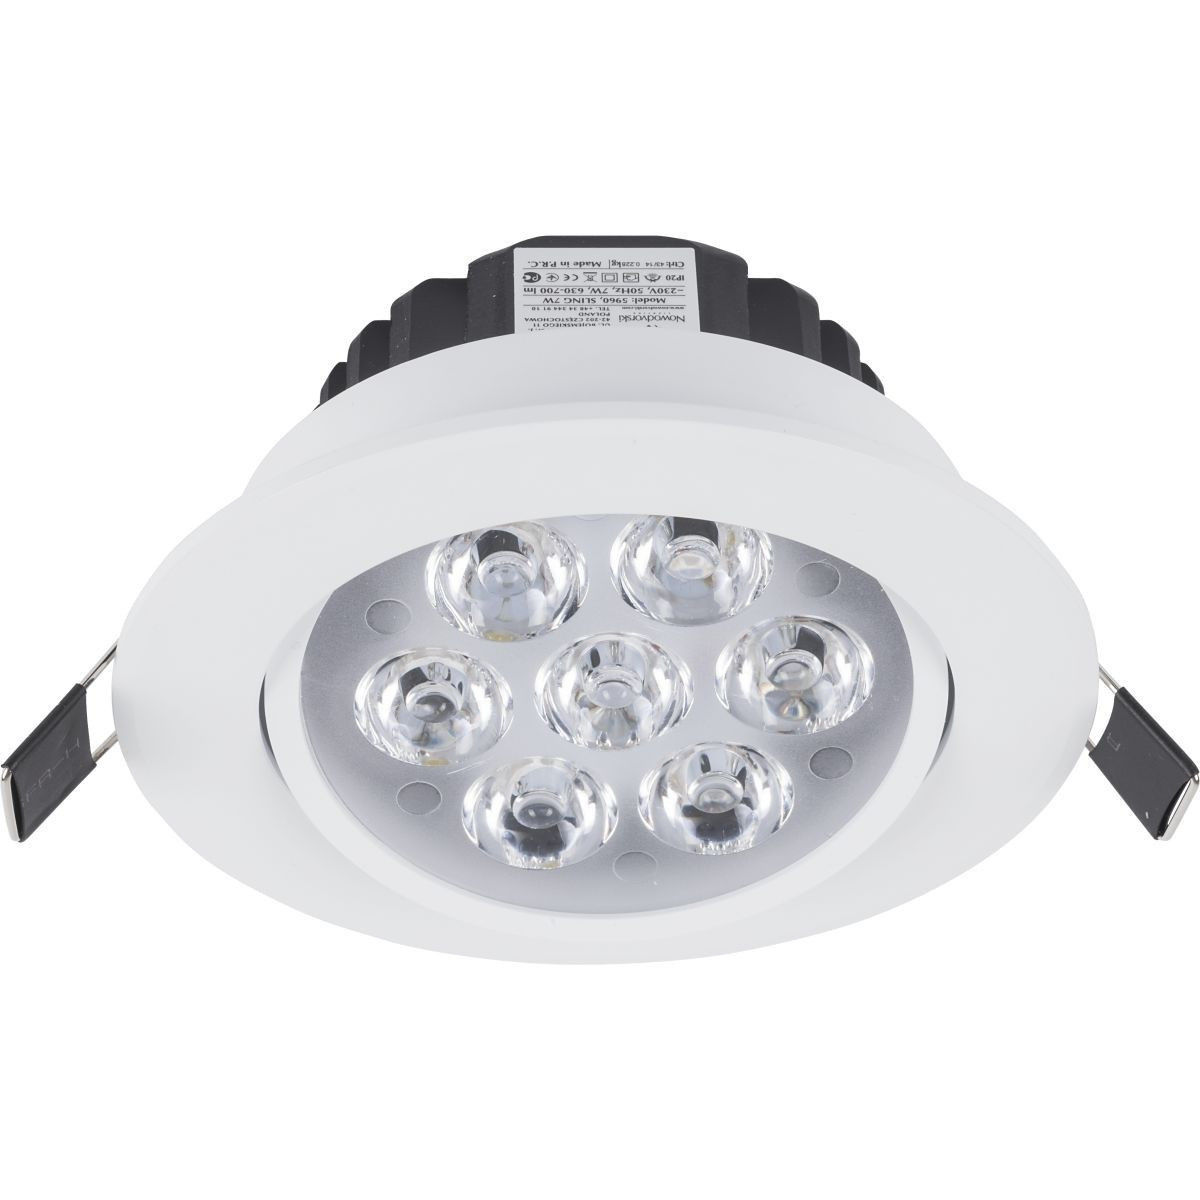 Світильник точковий Nowodvorski CEILING LED WHITE 5960